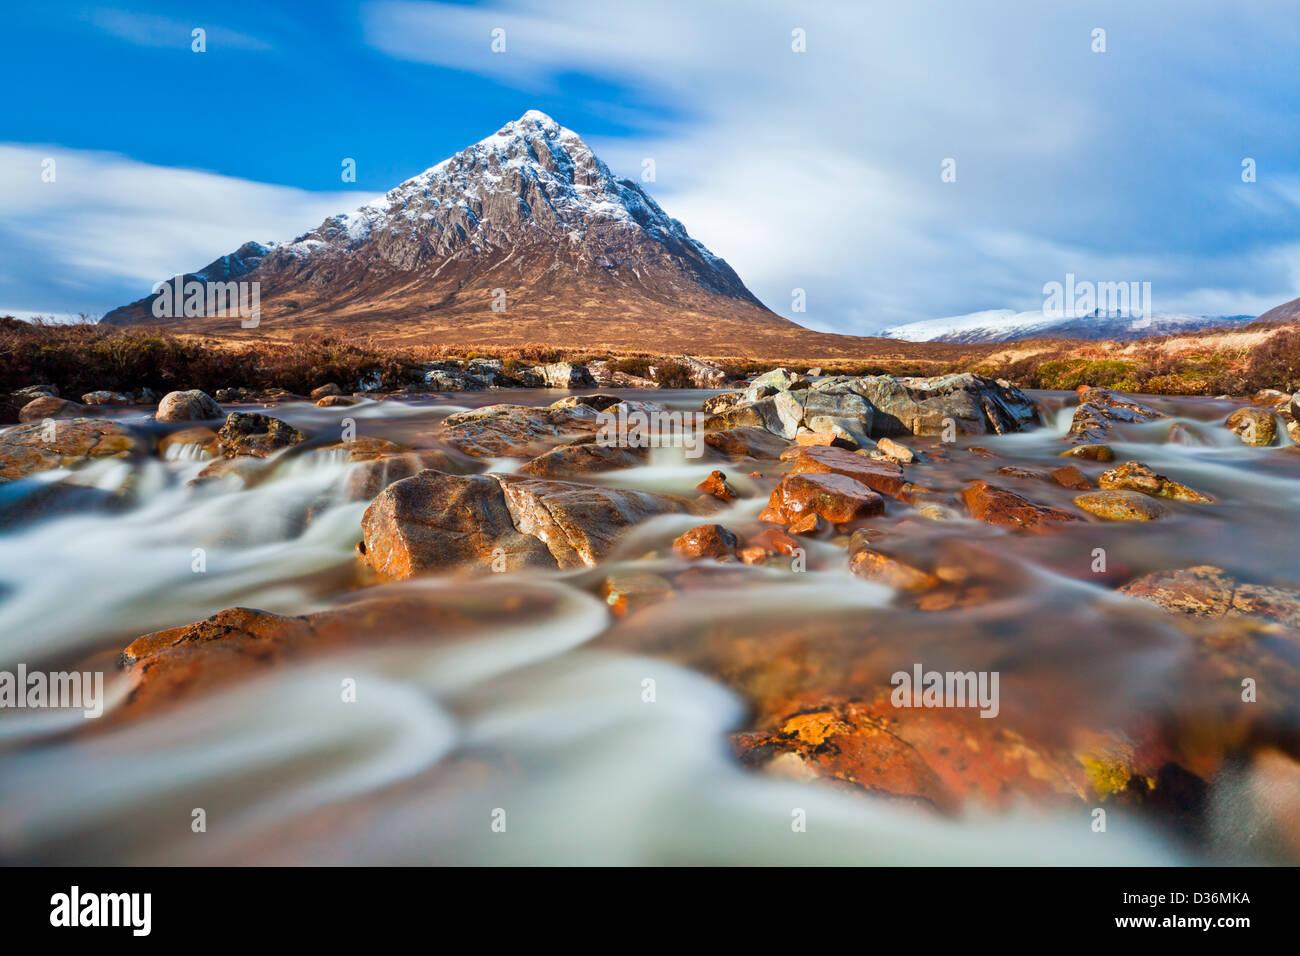 Buachaille Etive Mor and River Coupall Glen Coe Scottish Highlands Scotland UK - Stock Image